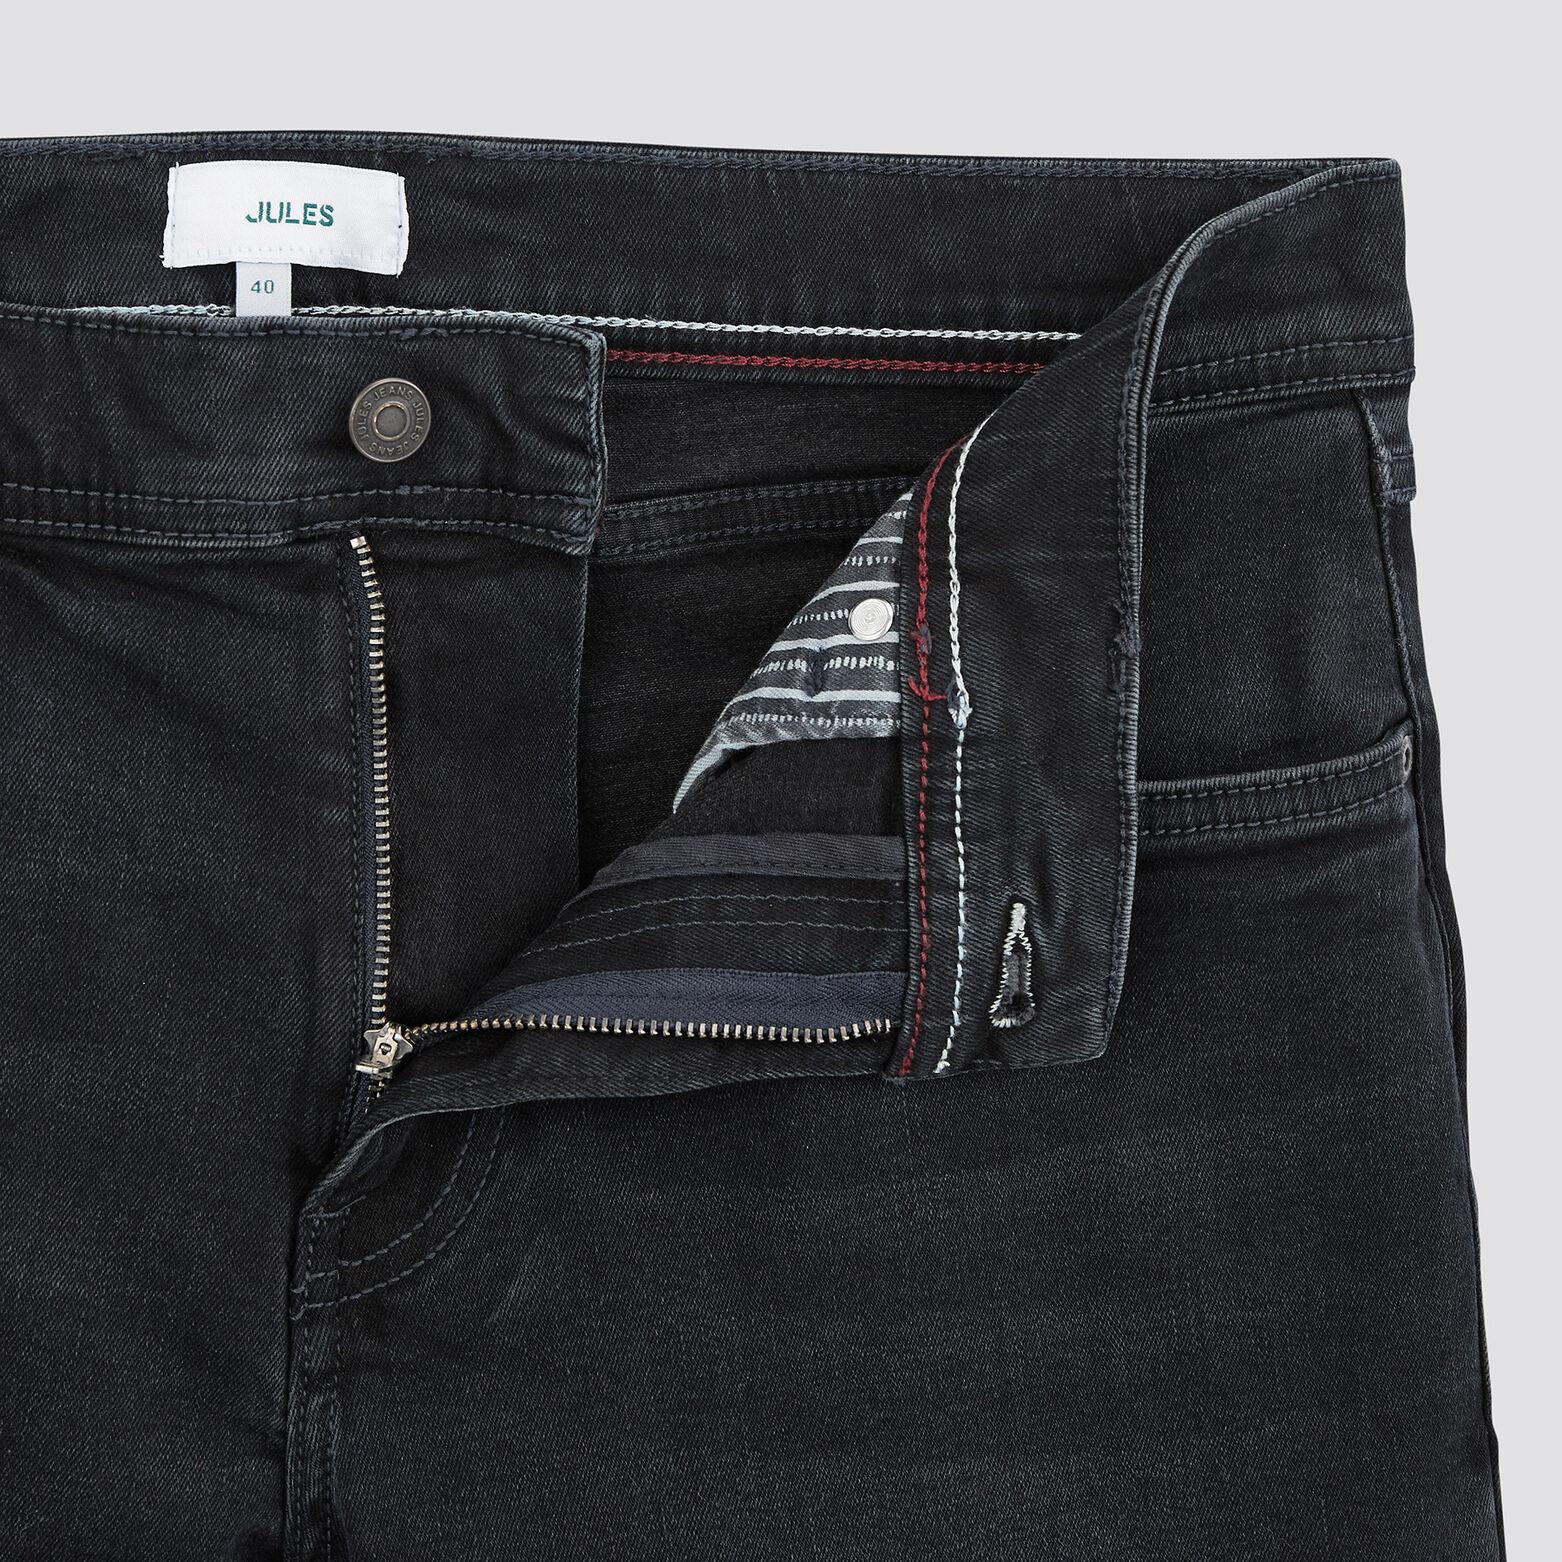 Bermuda 5 poches denim blue black